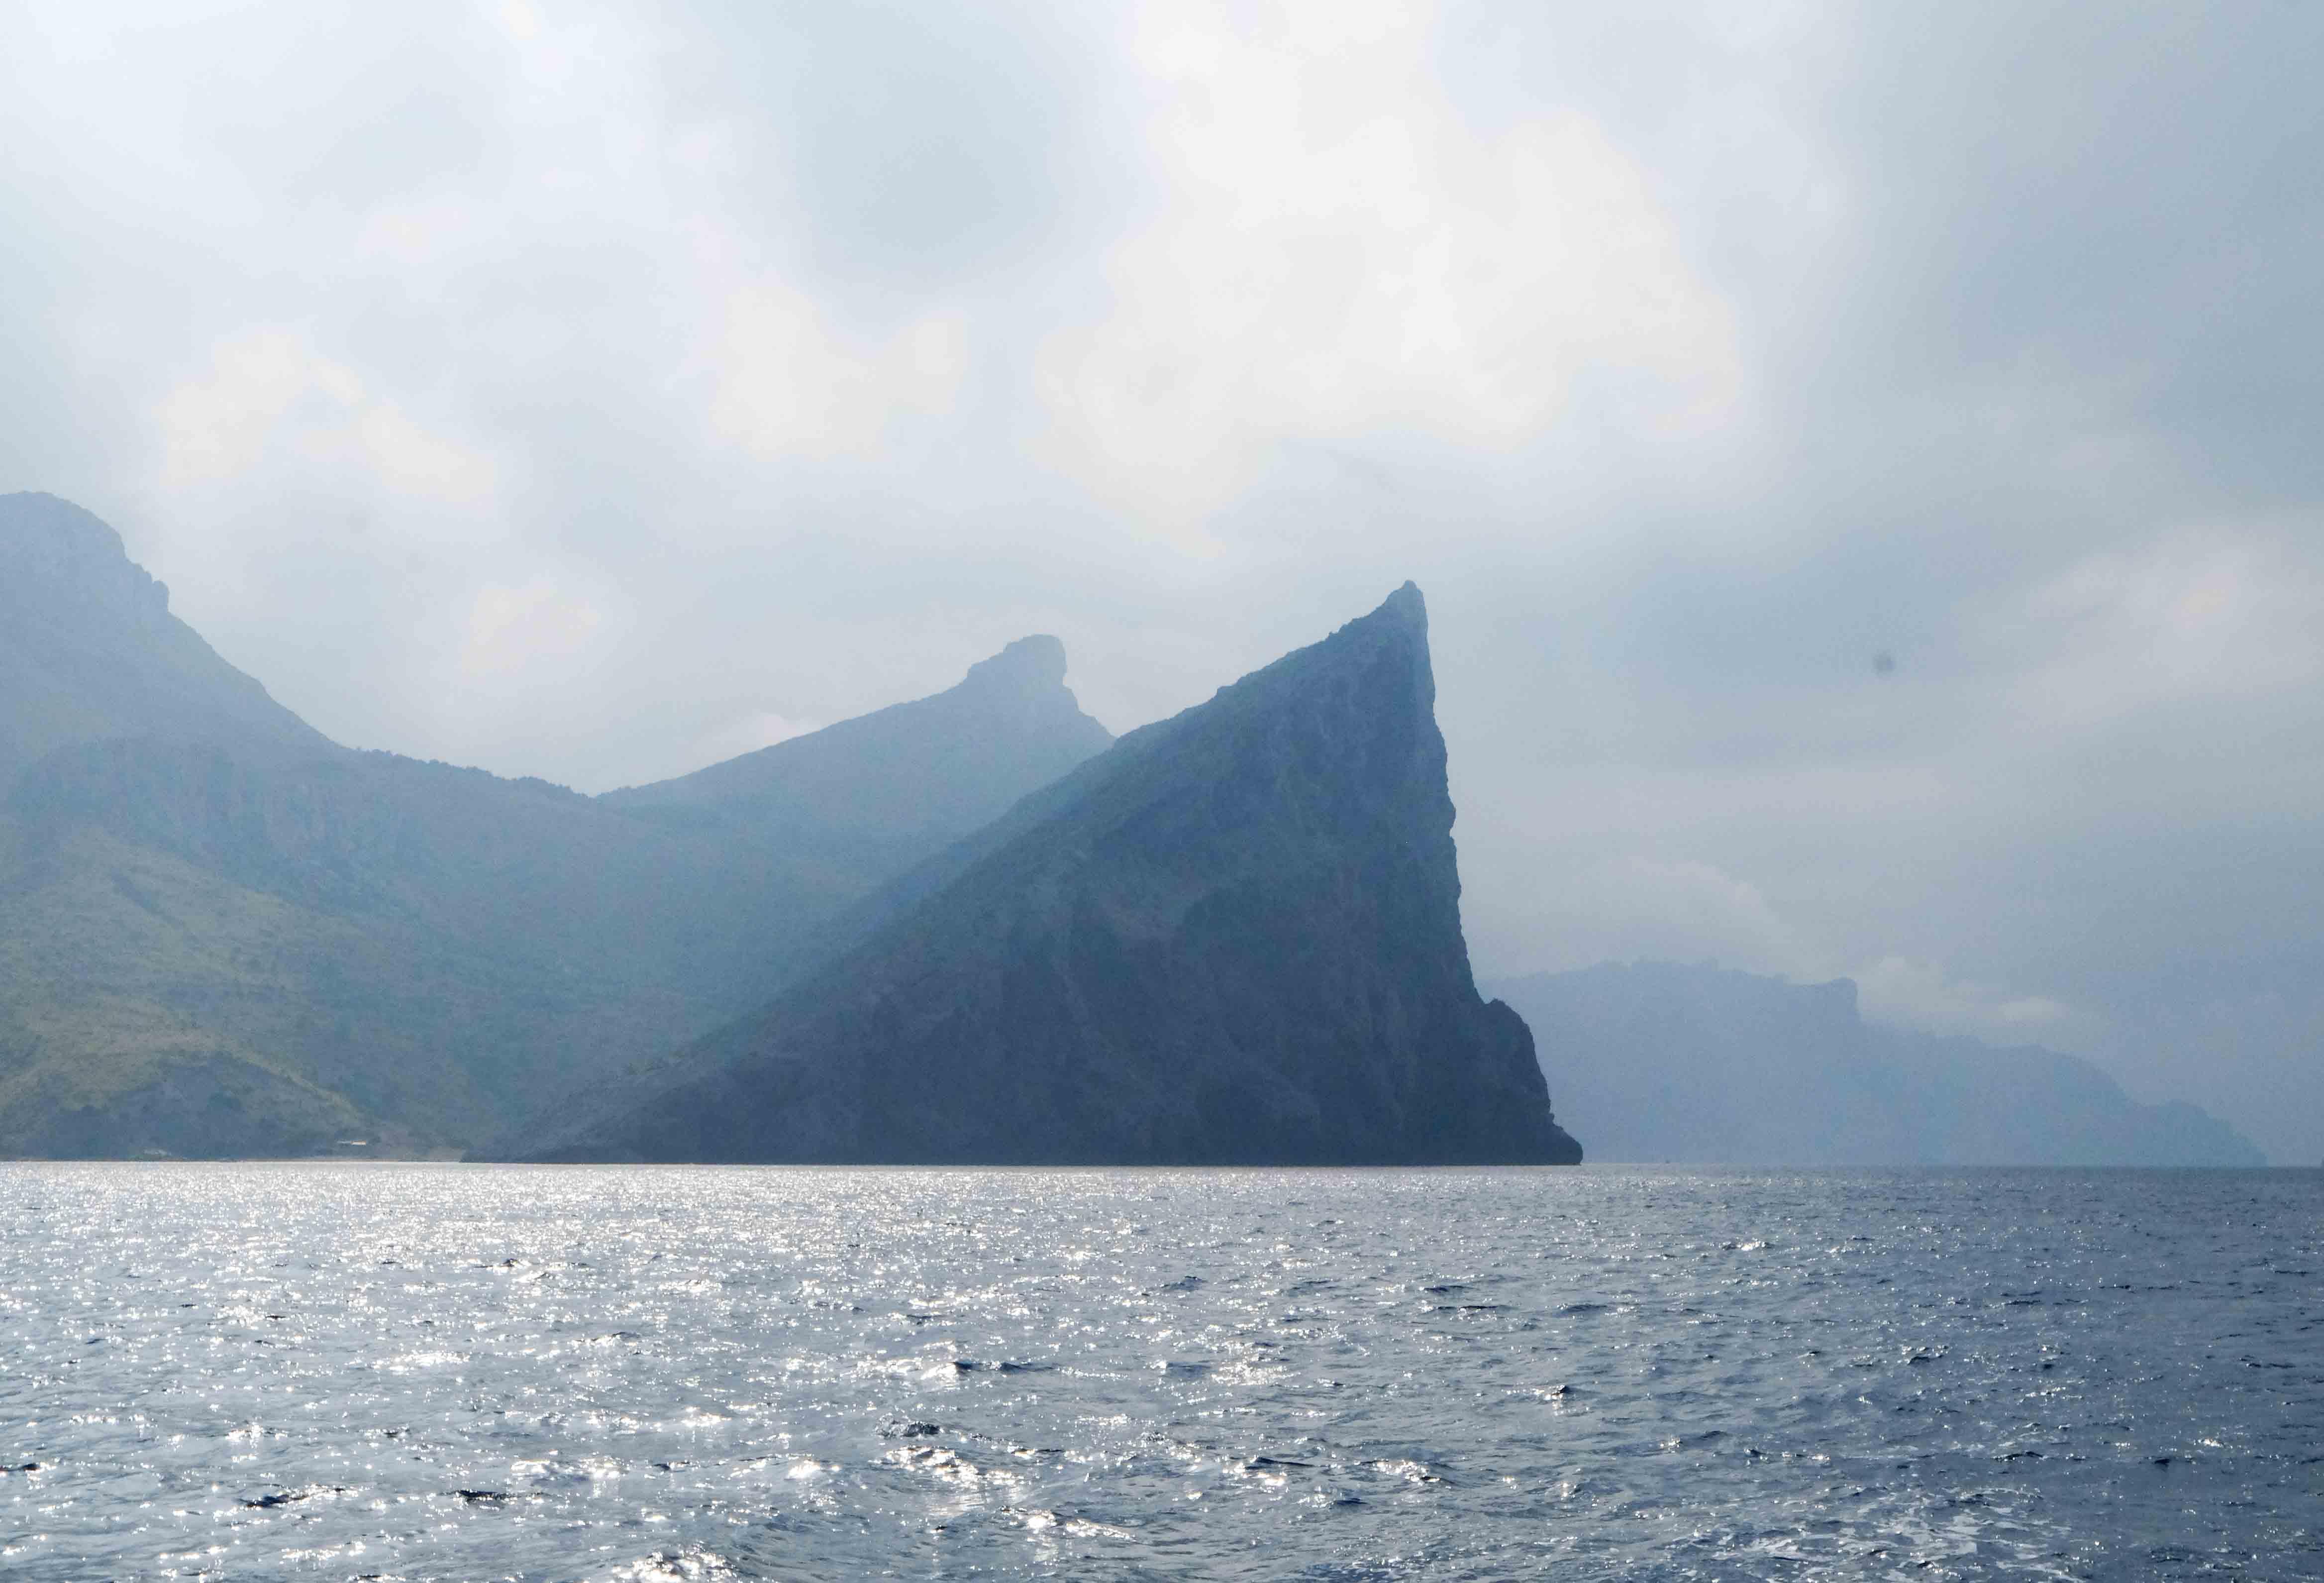 побережье рядом с форментором майорка